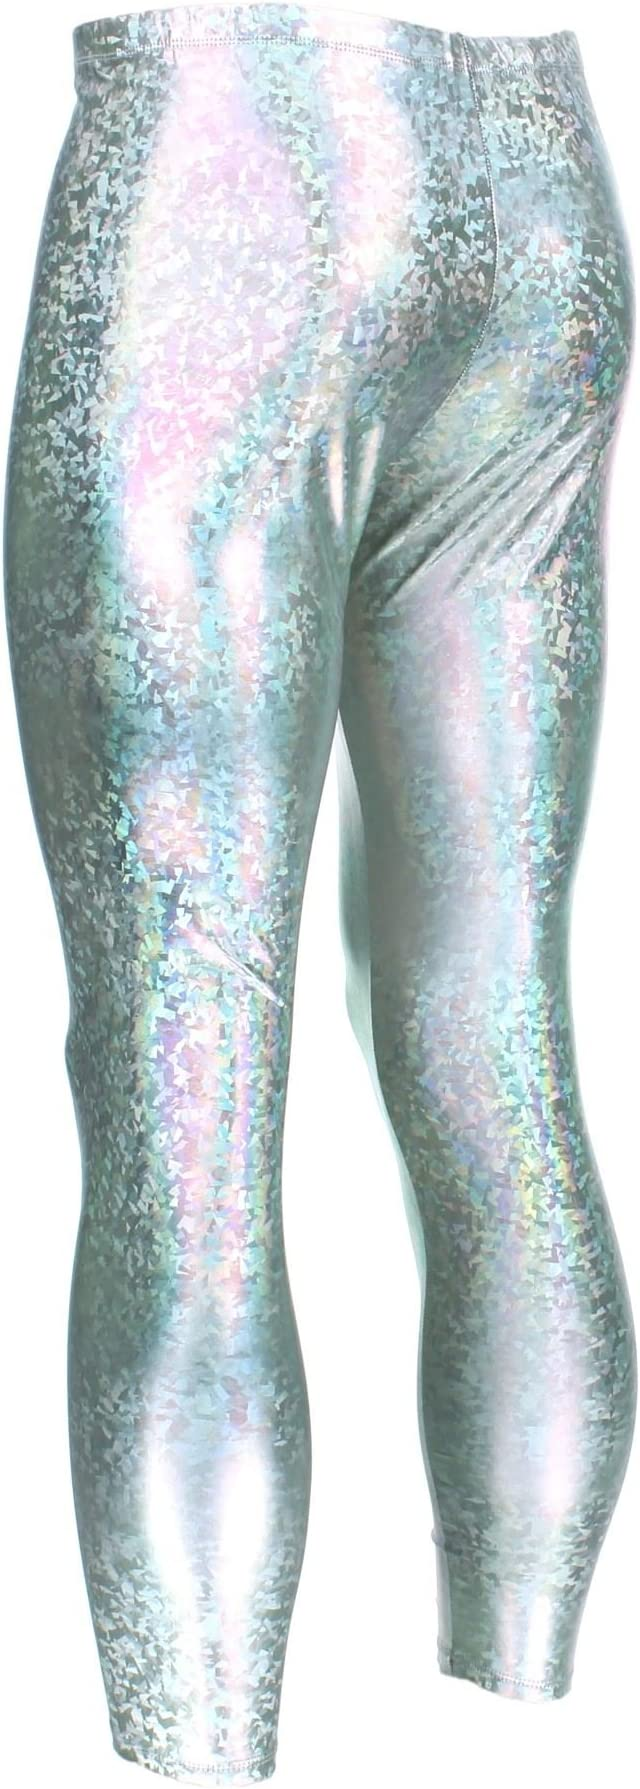 UK RAINBOW MERMAID SCALE LEGGINGS Metallic Festival Clubbing Party Gym Gift Idea